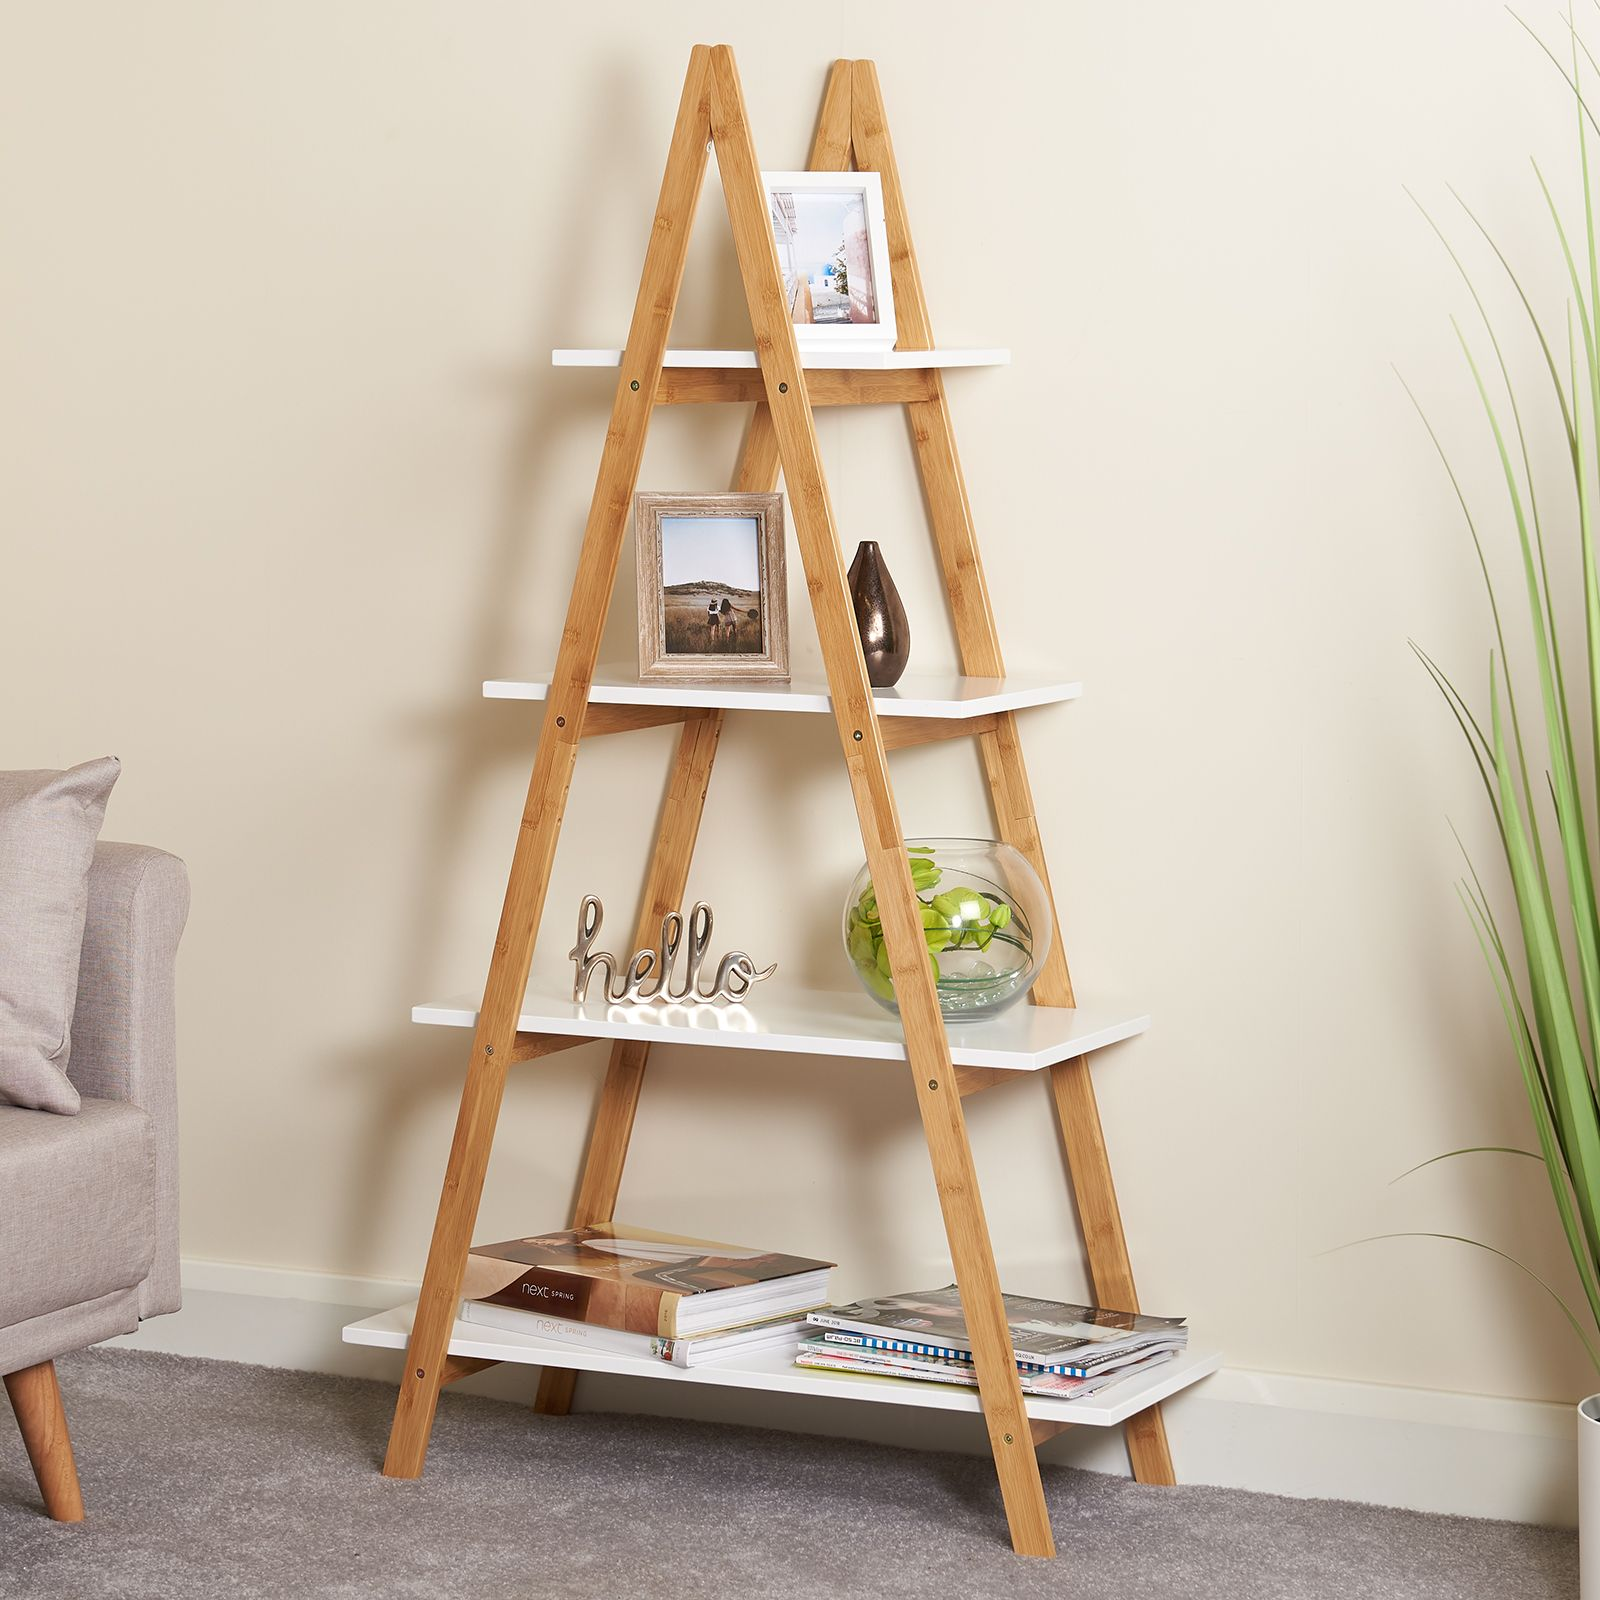 Details About Hartleys 4 Tier White Wooden Ladder Shelf Bookcase